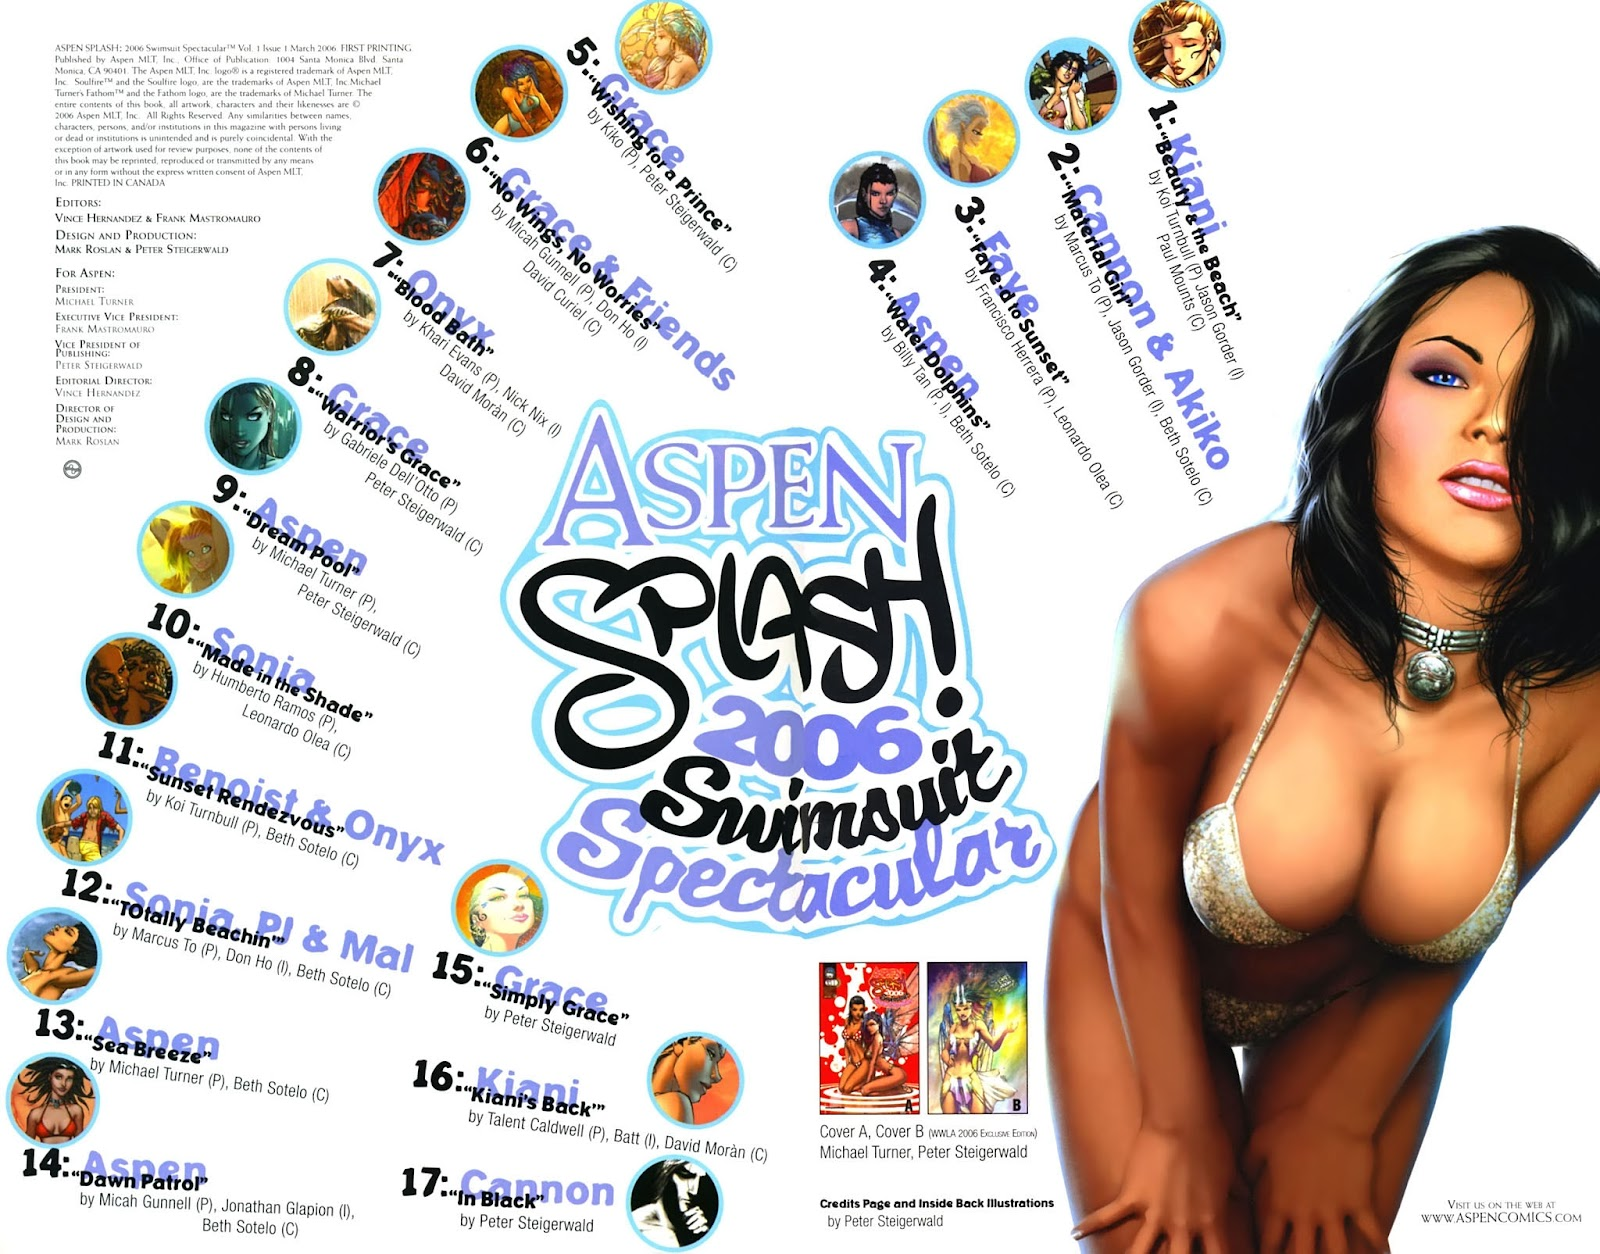 Read online Aspen Splash: Swimsuit Spectacular comic -  Issue # Issue 2006 - 2